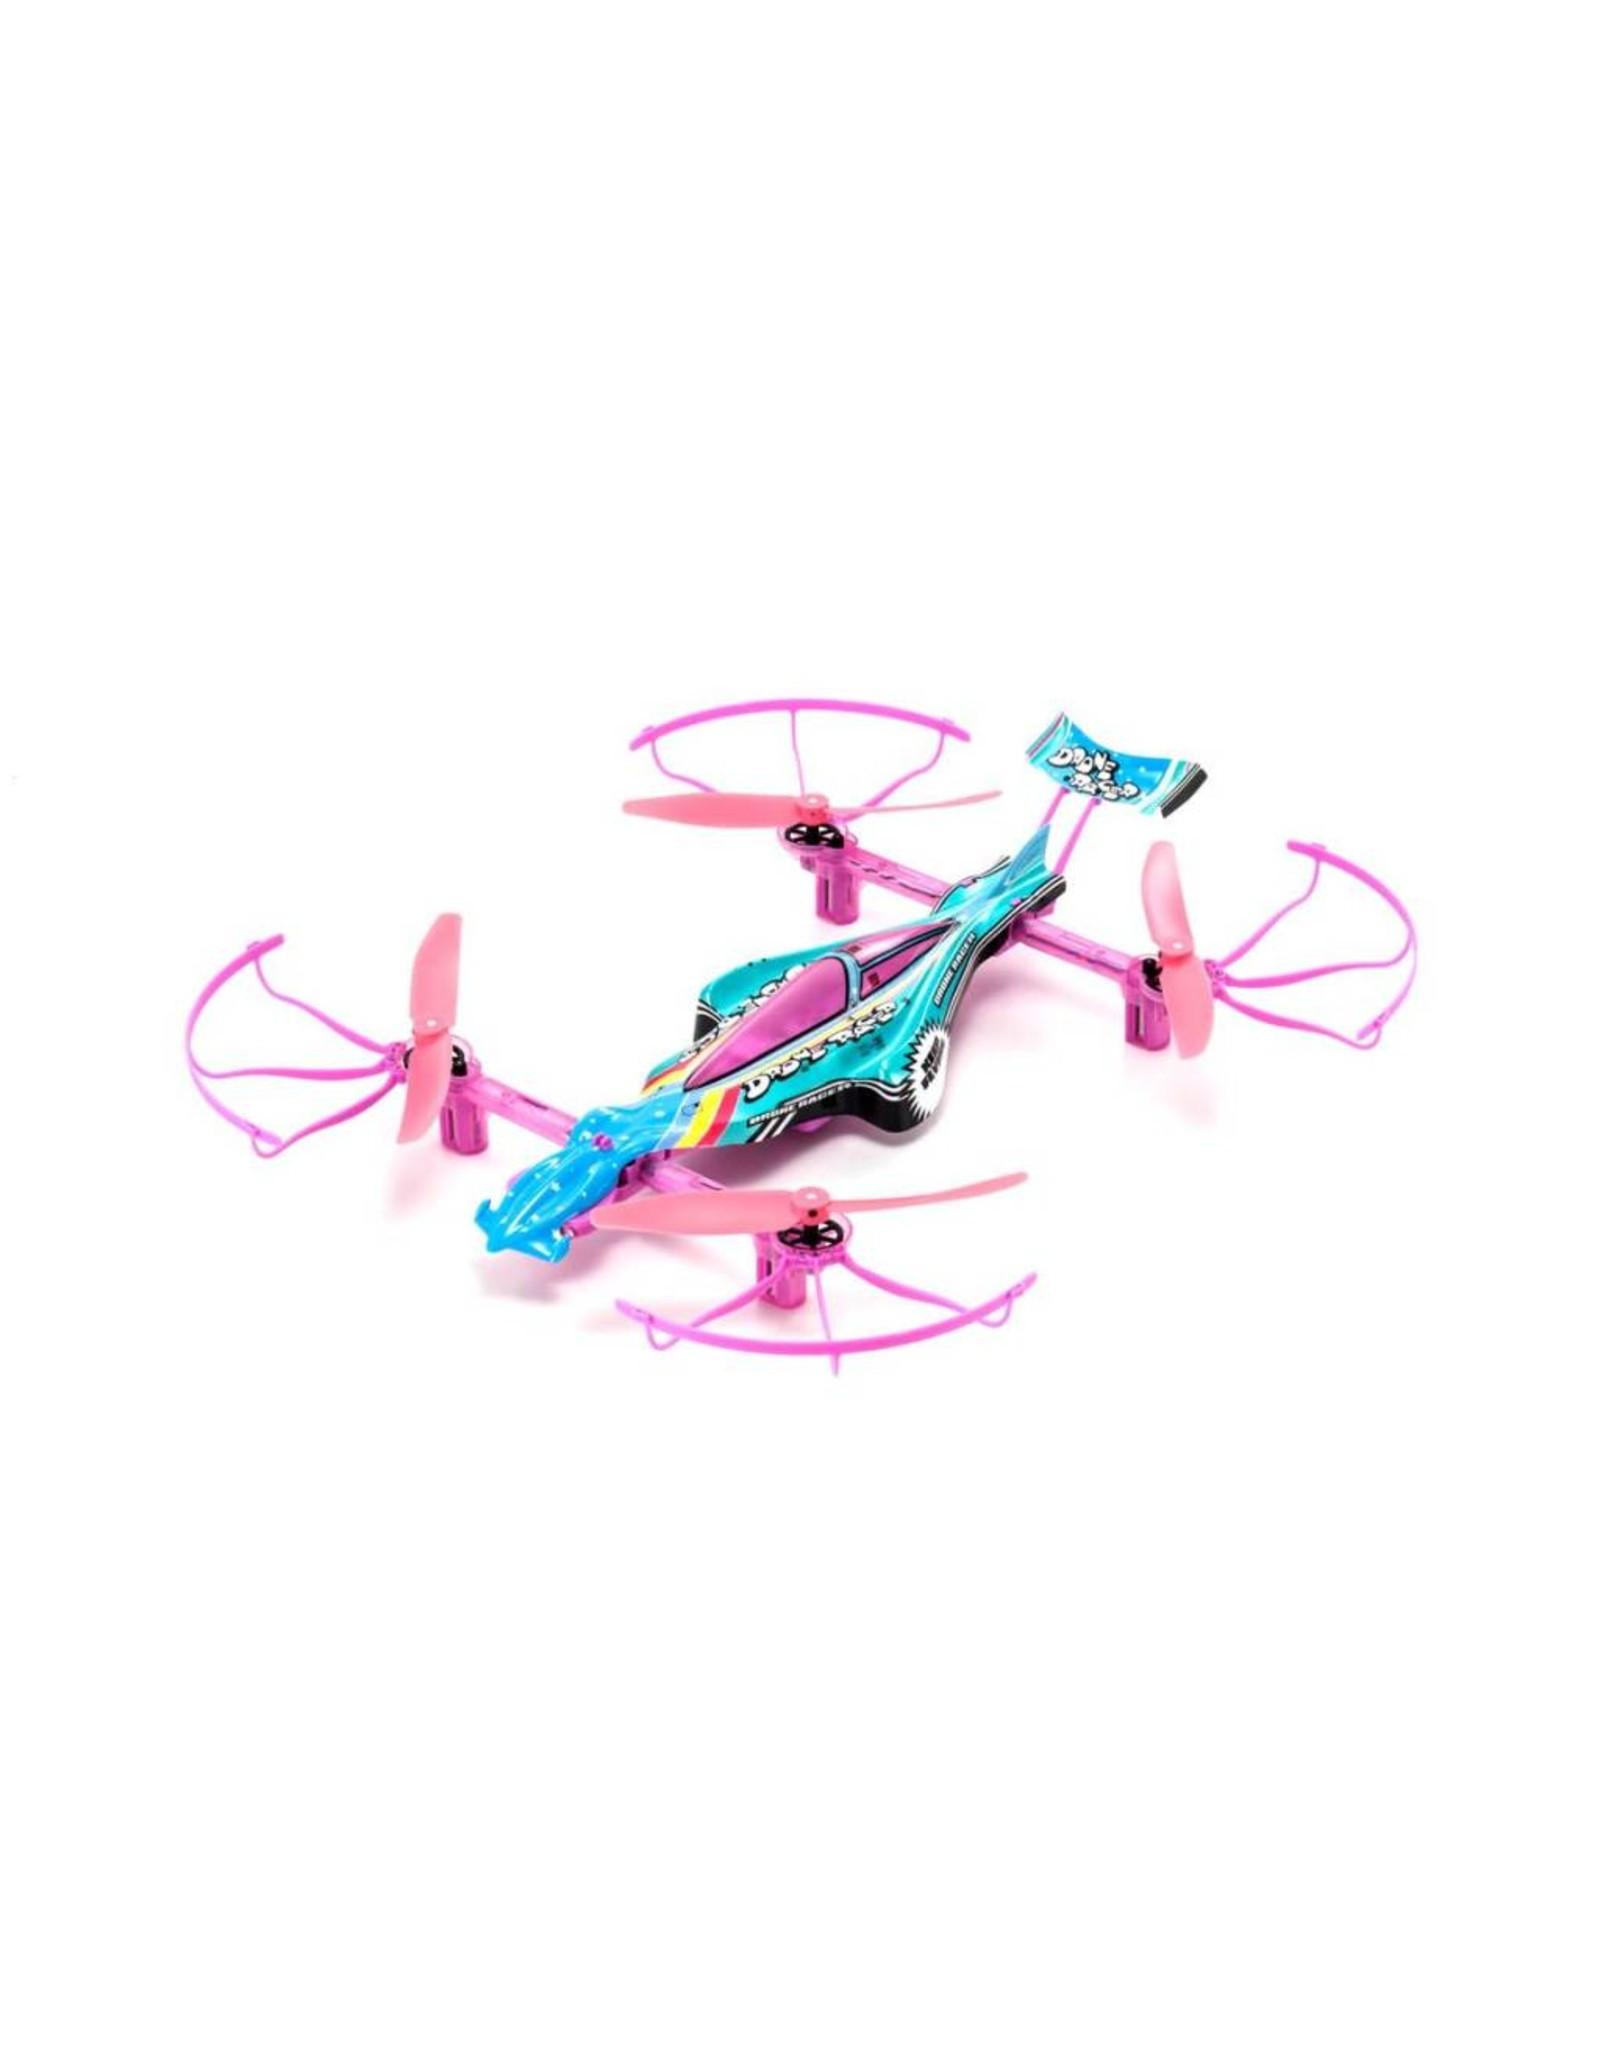 Kyosho DRONE RACER Pastel Rainbow